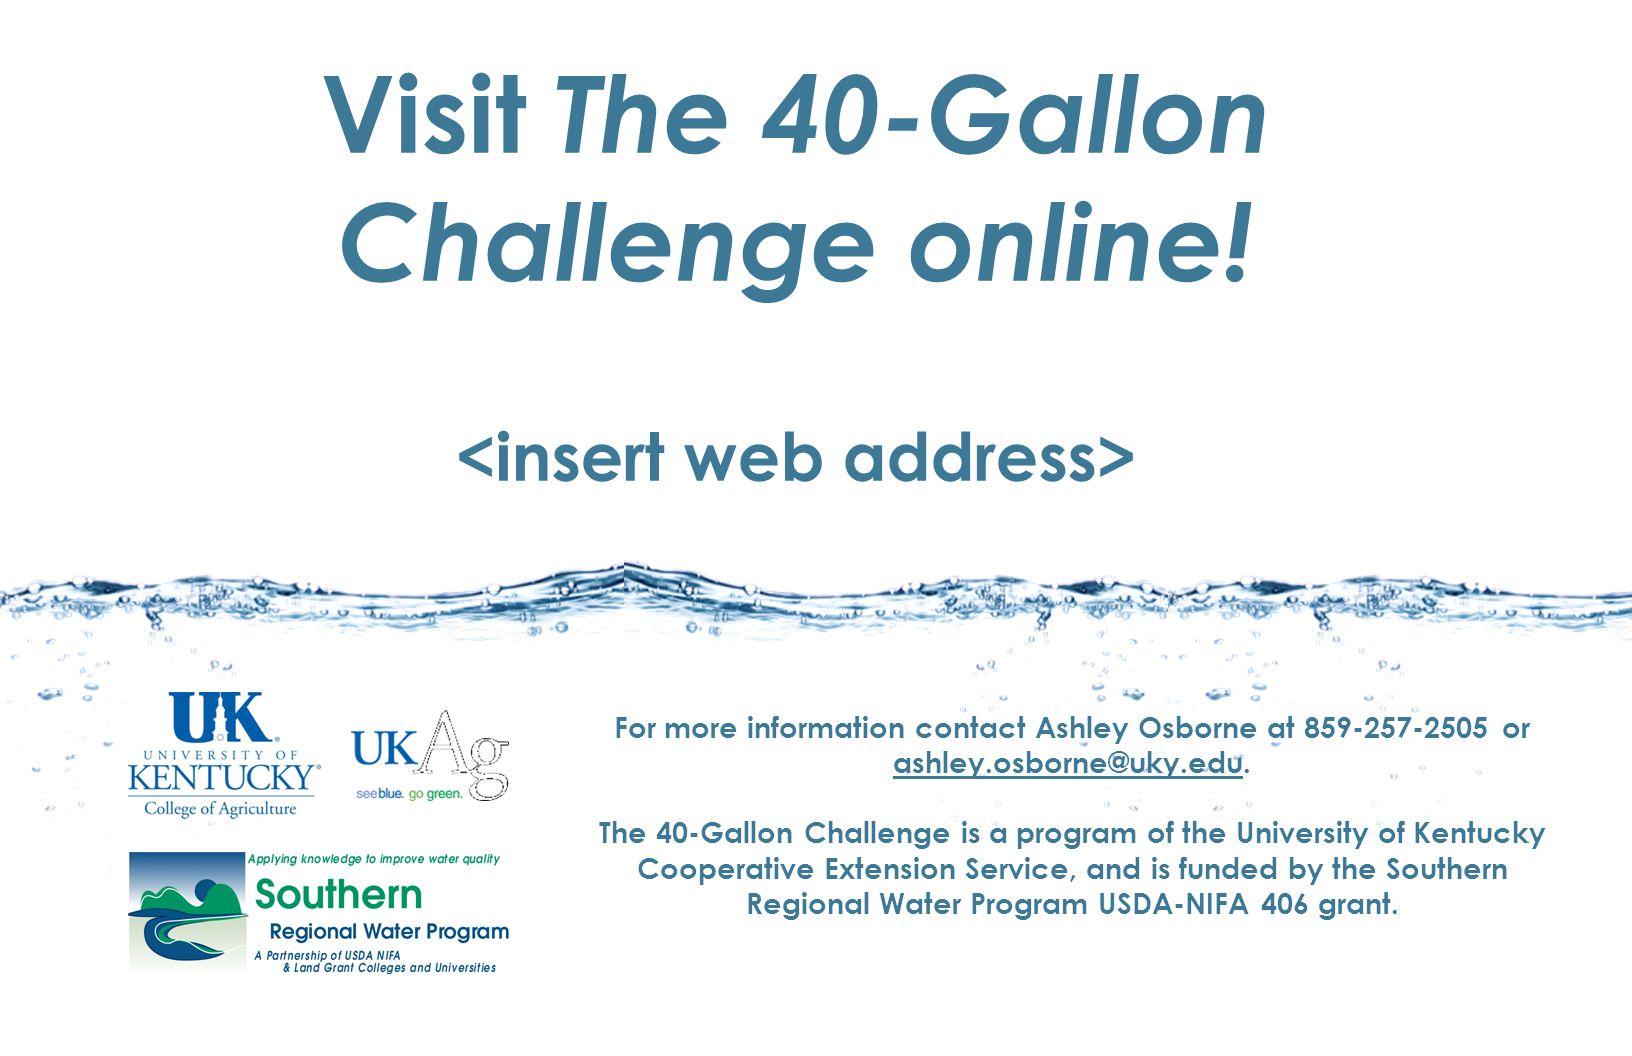 Visit The 40-Gallon Challenge online.